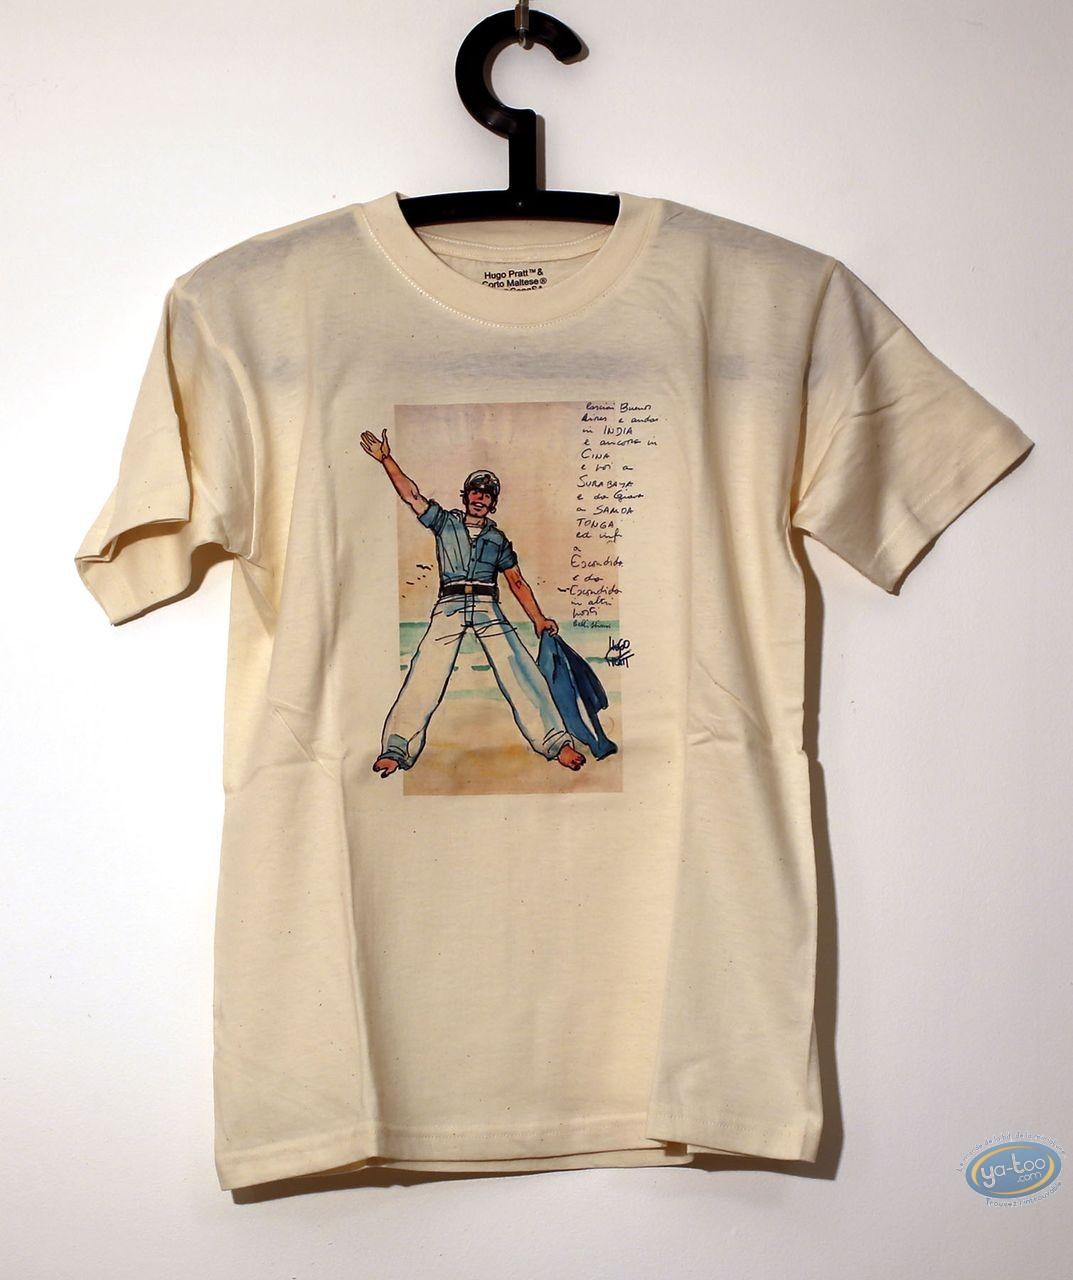 Vêtement, Corto Maltese : T-shirt, Kid 08/02 - 7/8 ans